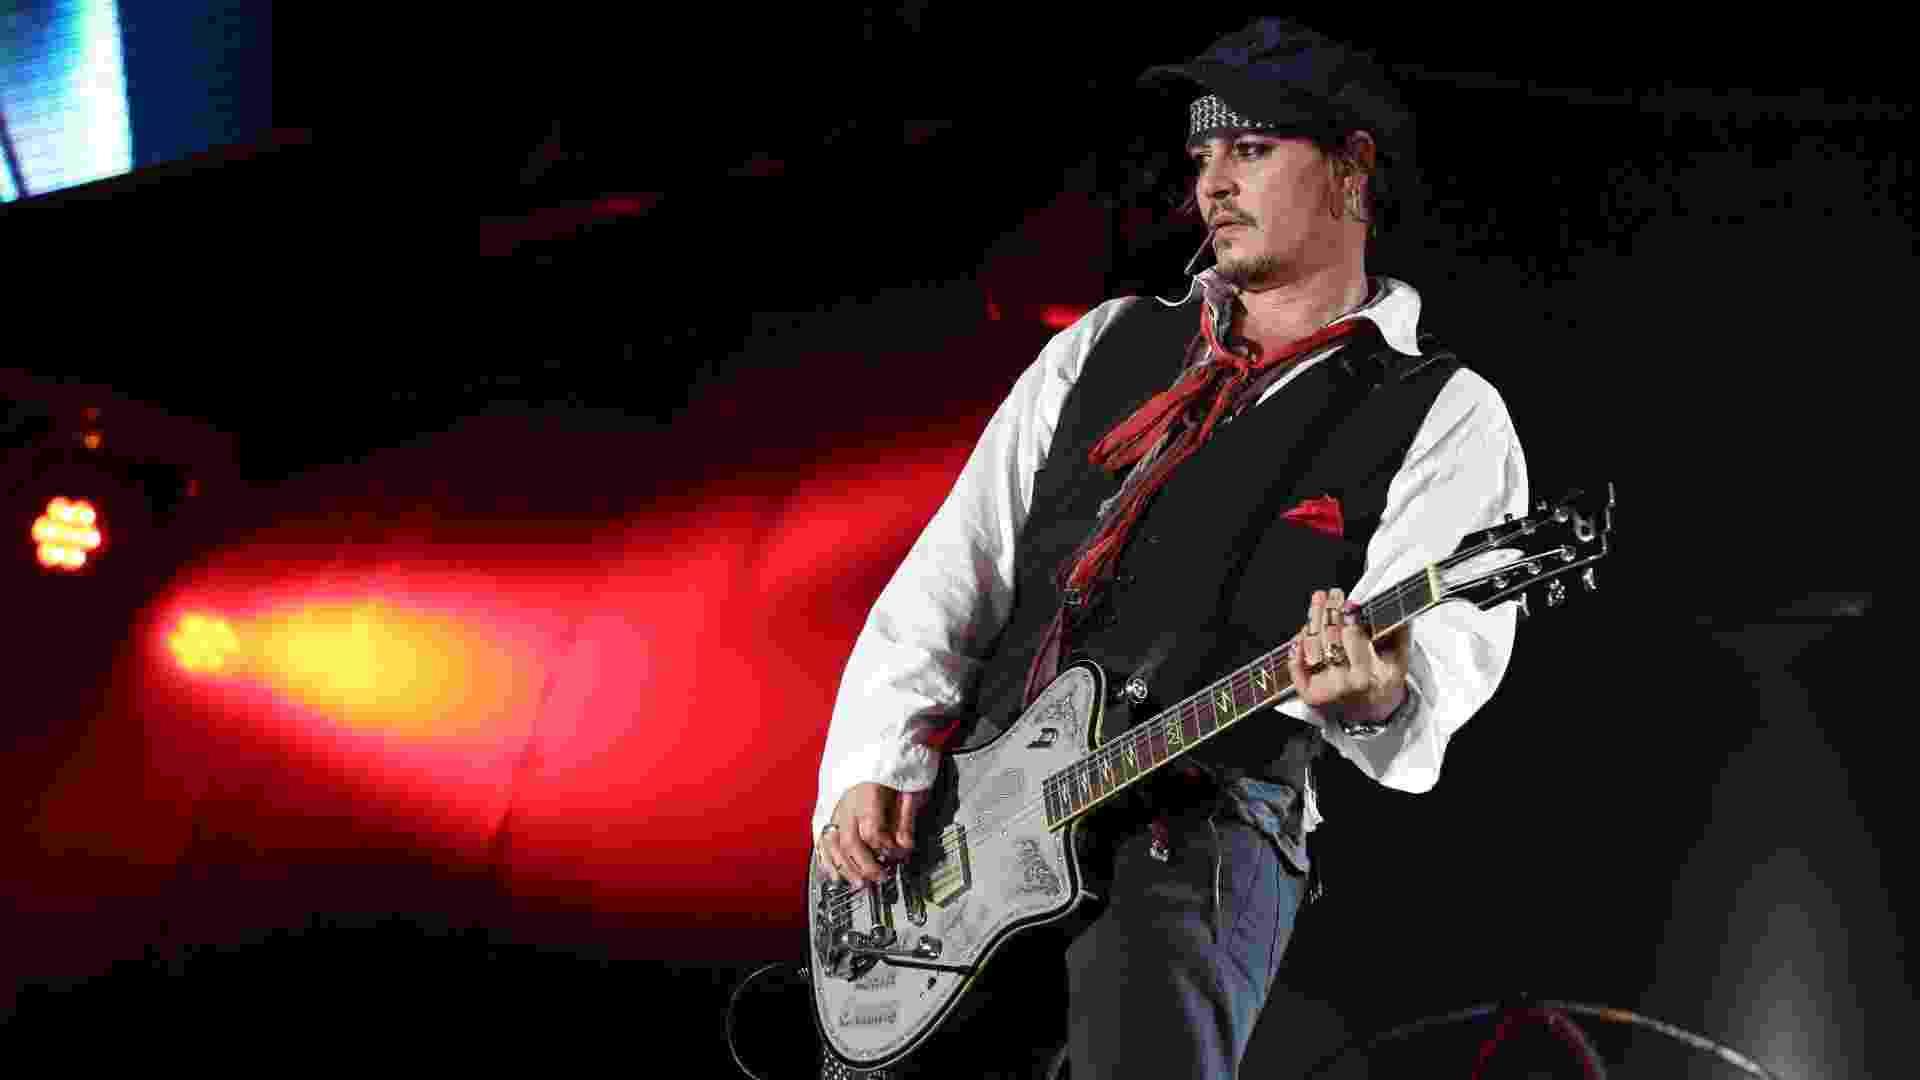 24.set.2015 - Johnny Depp se apresenta no grupo Hollywood Vampire no palco Mundo no Rock in Rio 2015 - Marco Teixeira/UOL